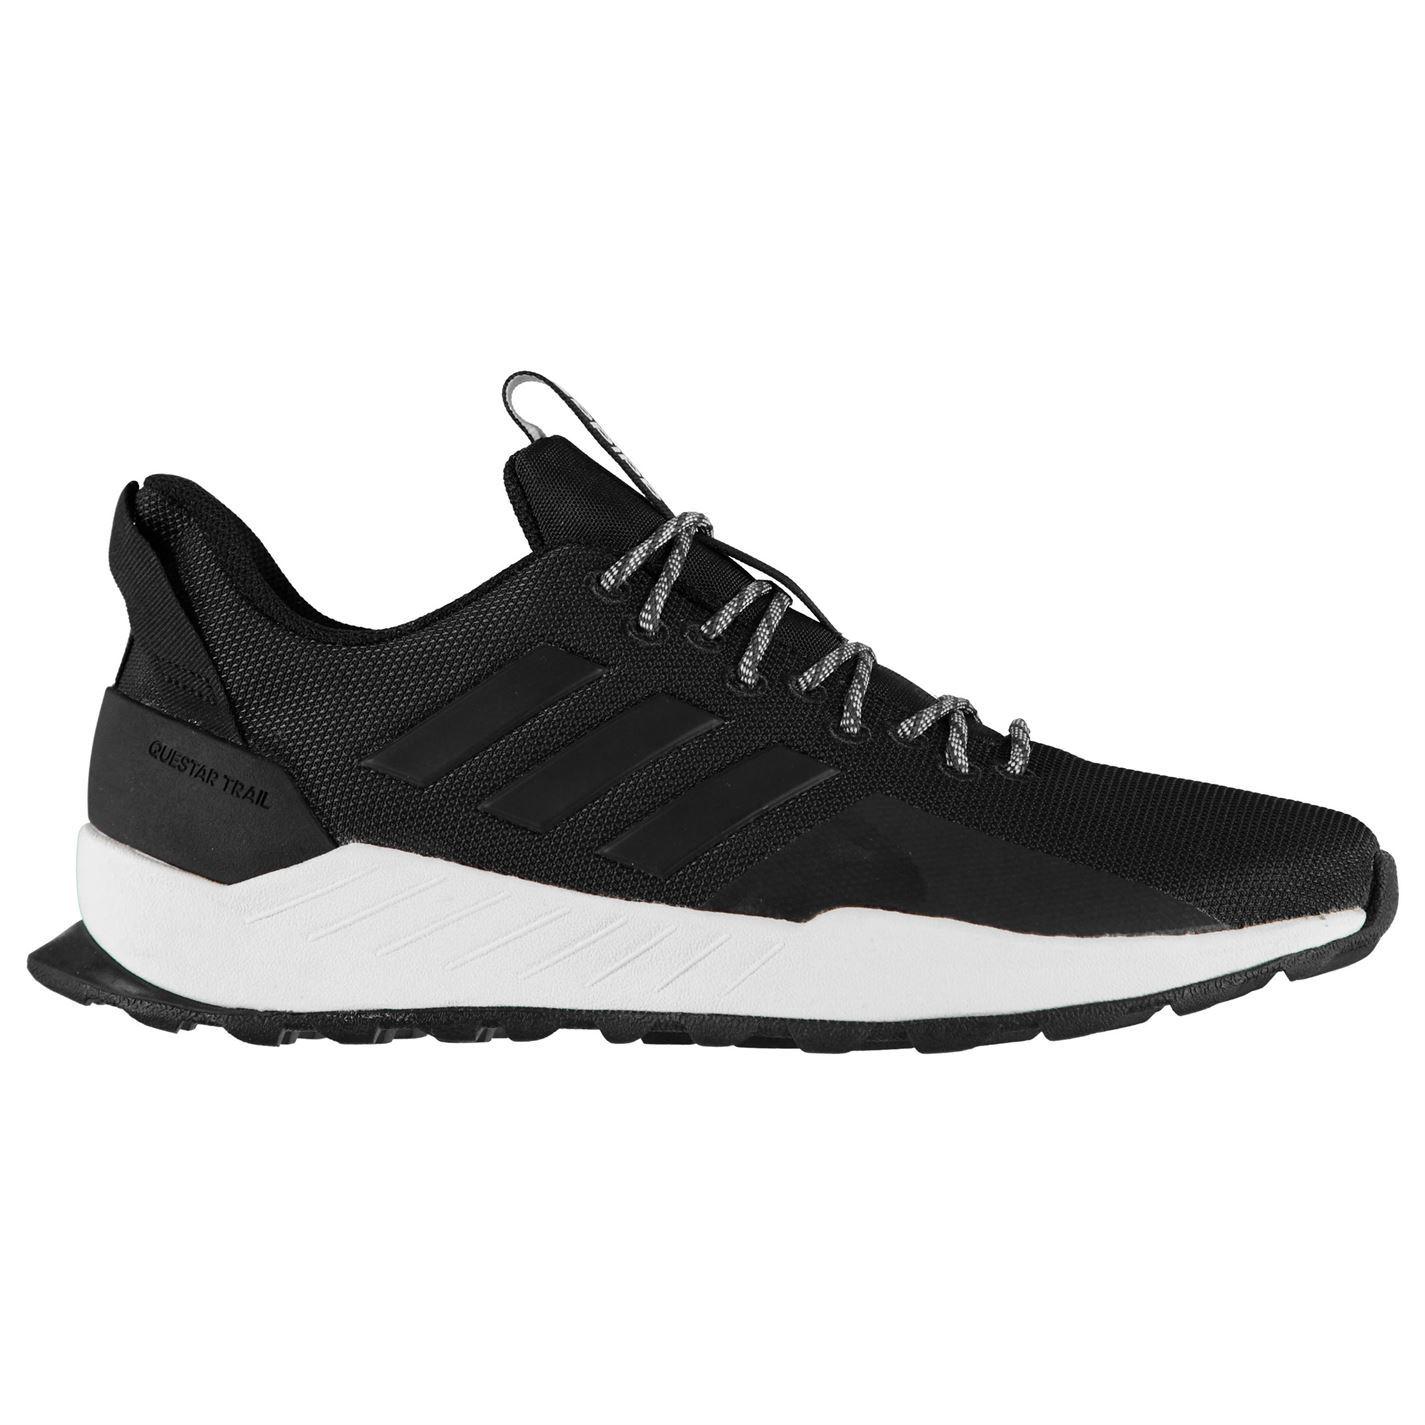 Adidas corredores para hombre Questar Trail 84 corredores Adidas dc7656